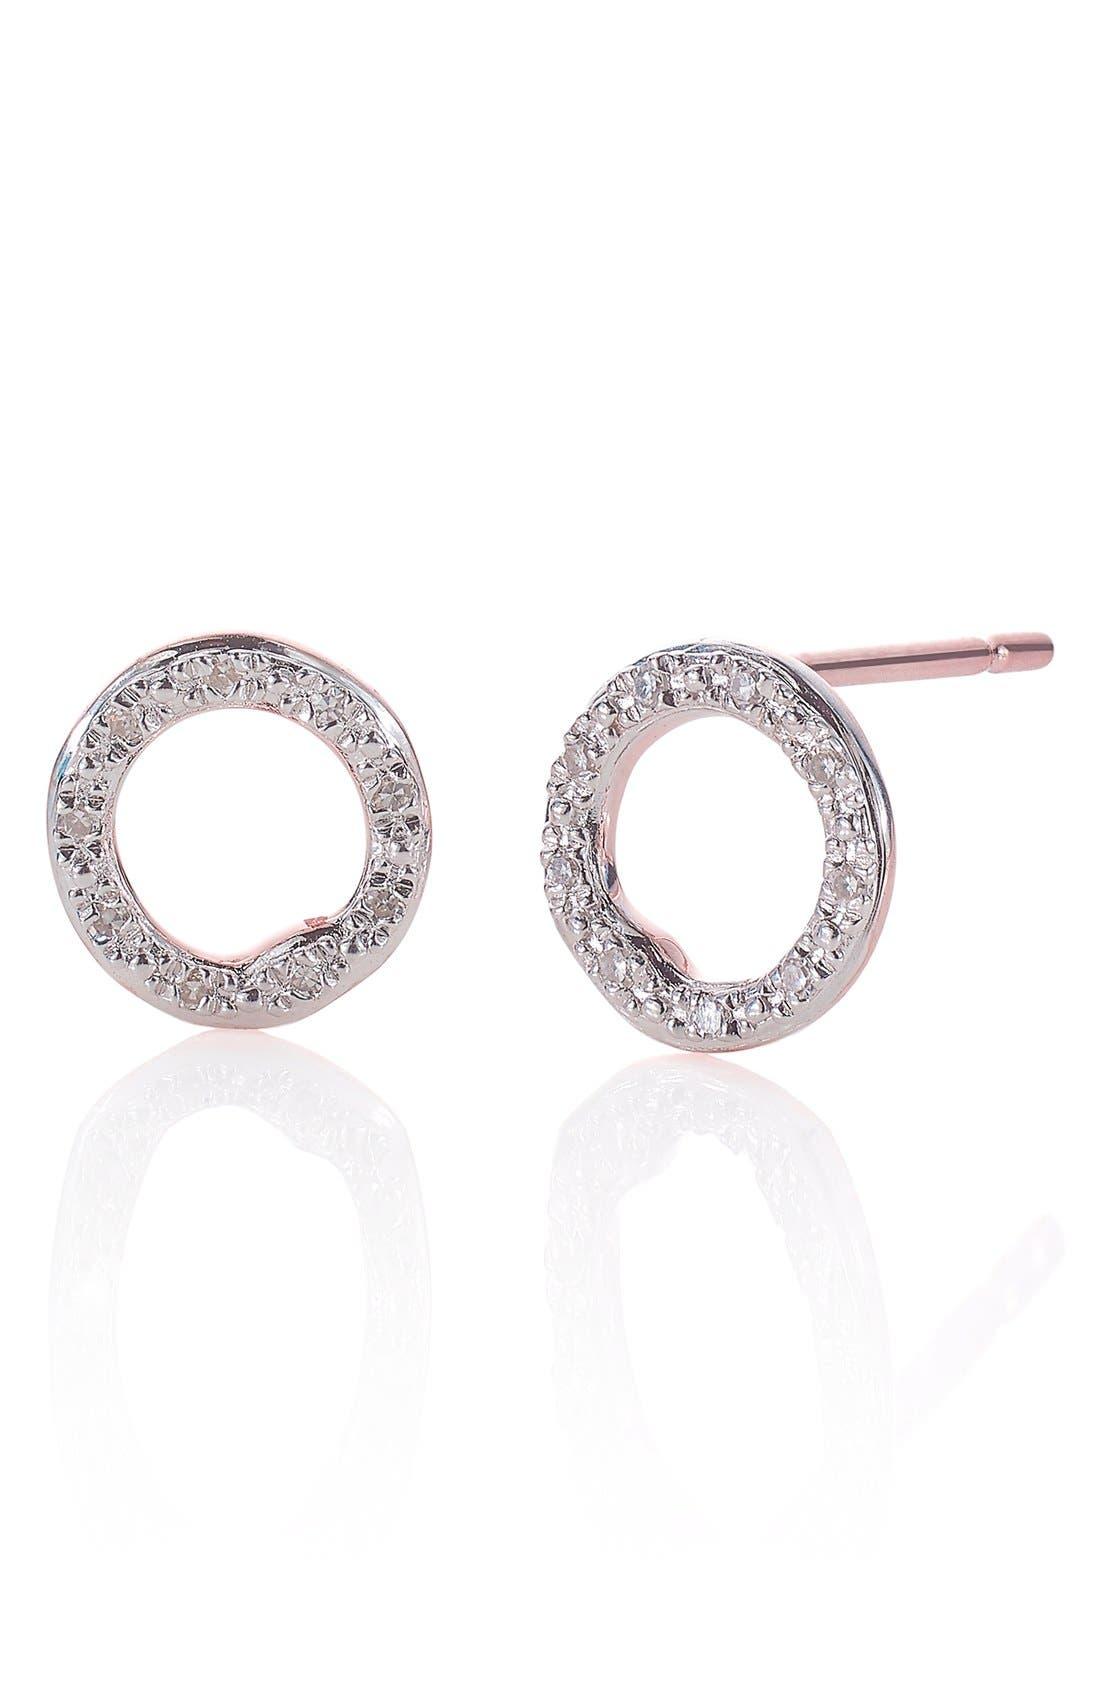 'Riva' Circle Stud Diamond Earrings,                         Main,                         color, Rose Gold